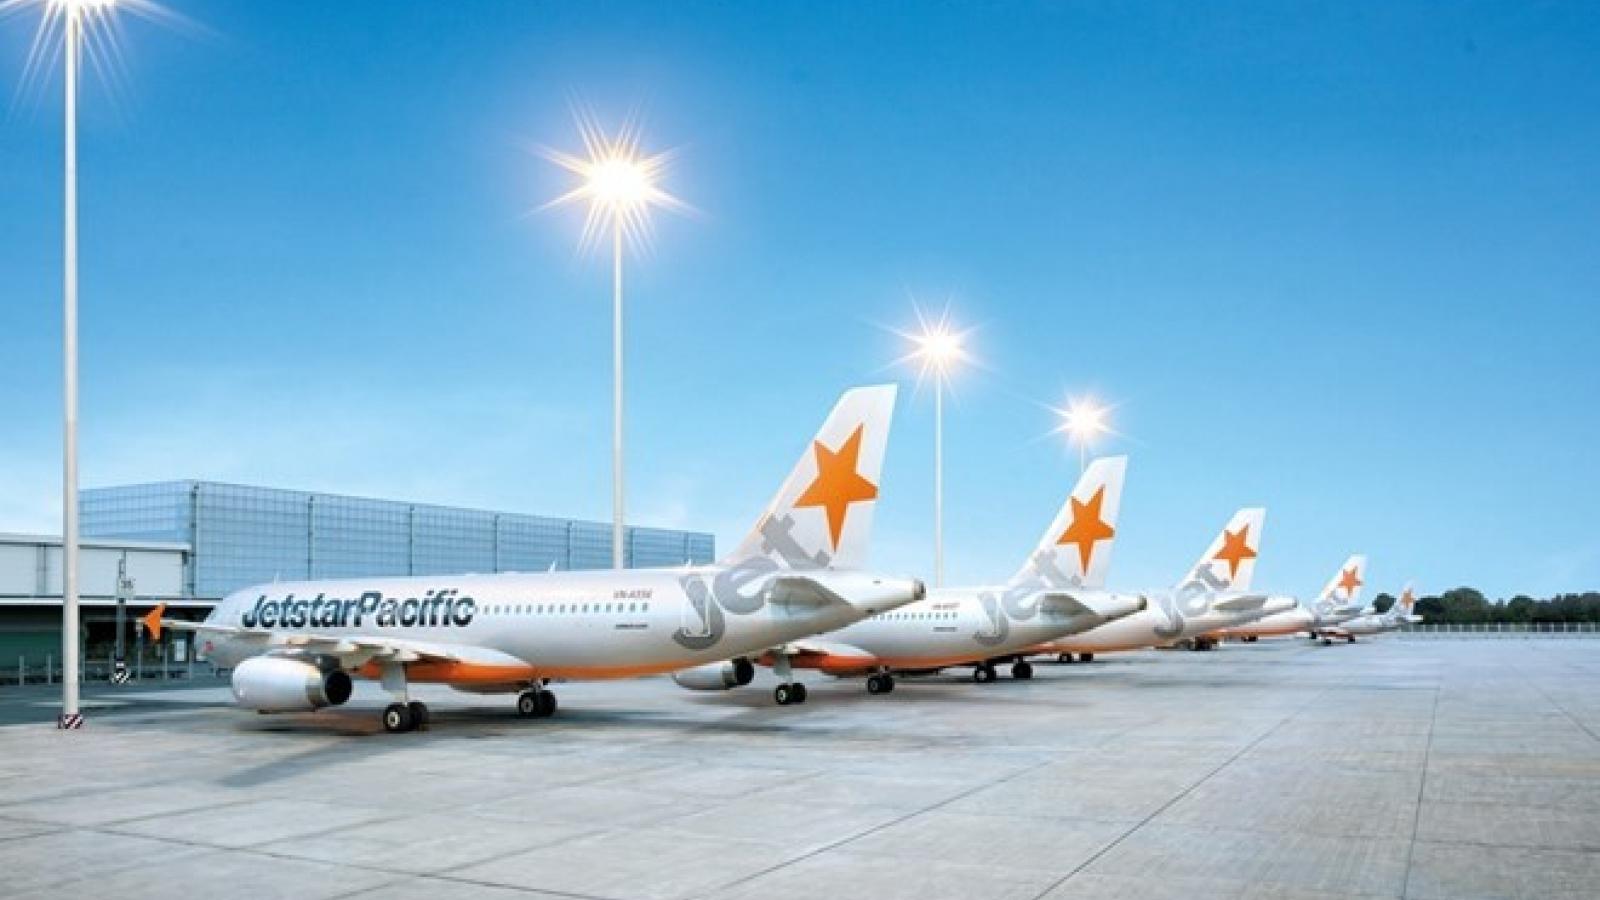 Jetstar Pacific inaugurates Hue-Nha Trang route